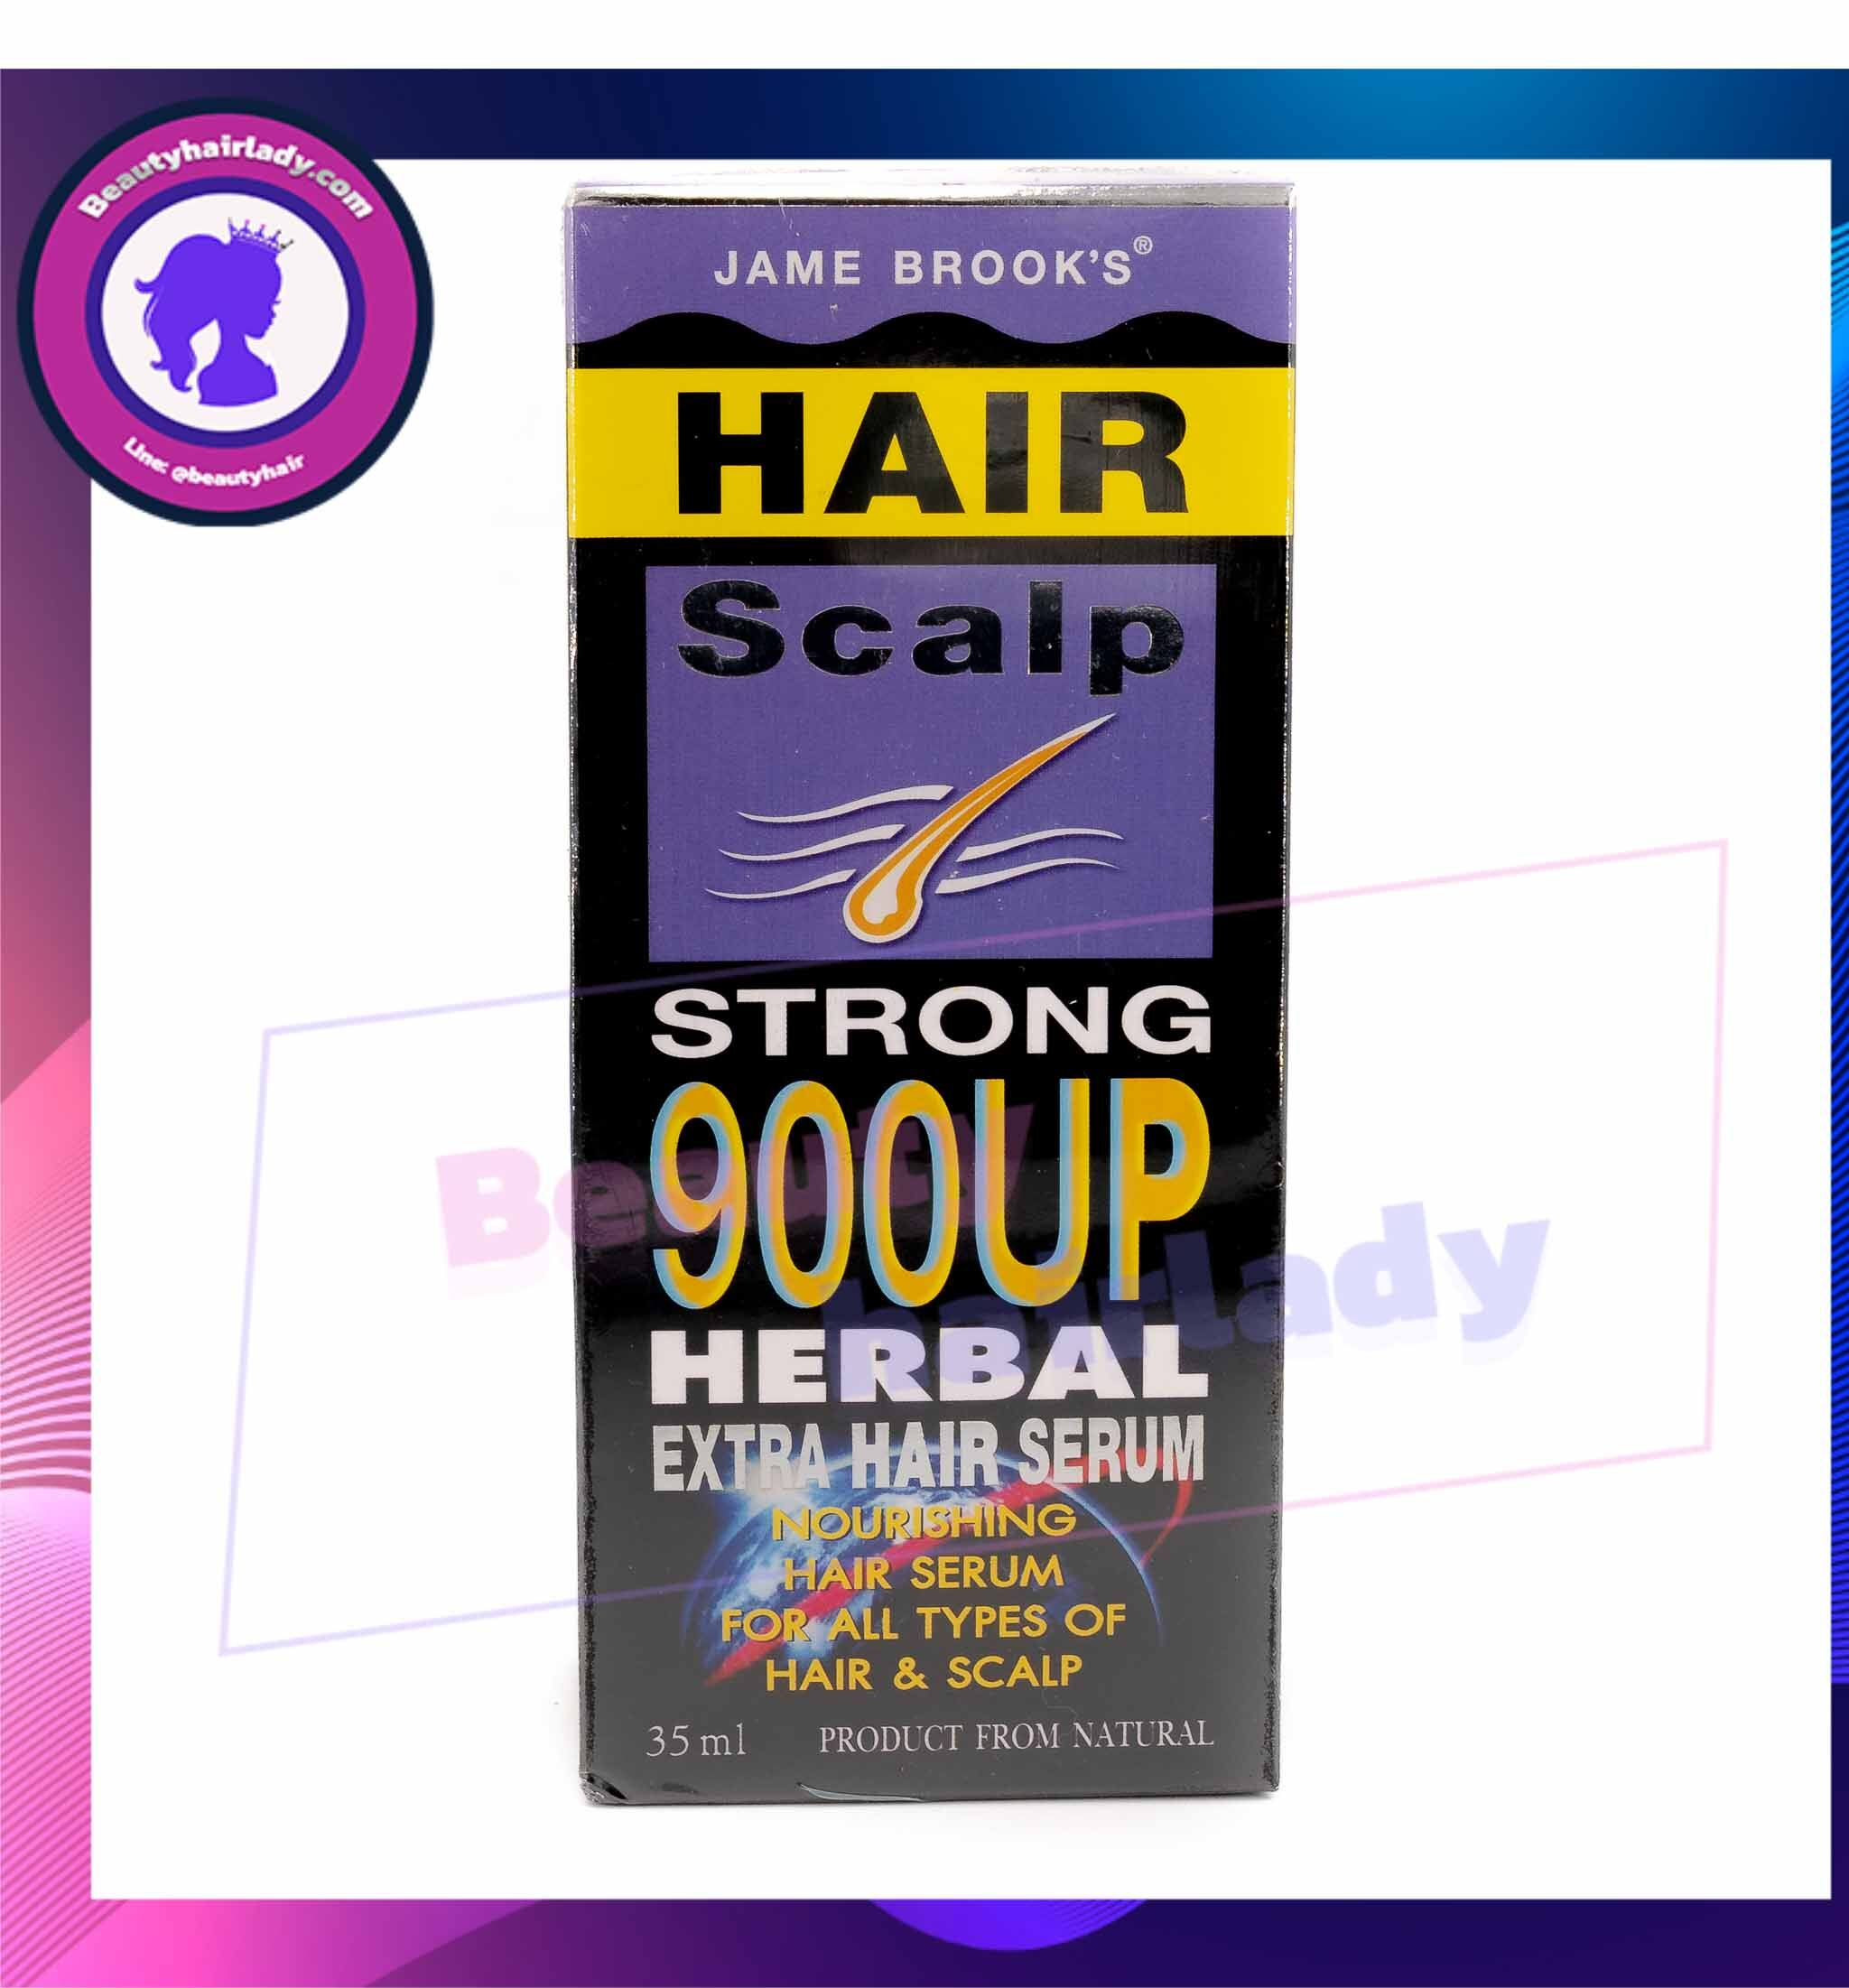 Jame Brooks Hair Serum *เข้มข้น* เจม บรูคส์ แฮร์ เซรั่ม สมุนไพร ปลูกผม บํารุงเส้นผม 35ml.